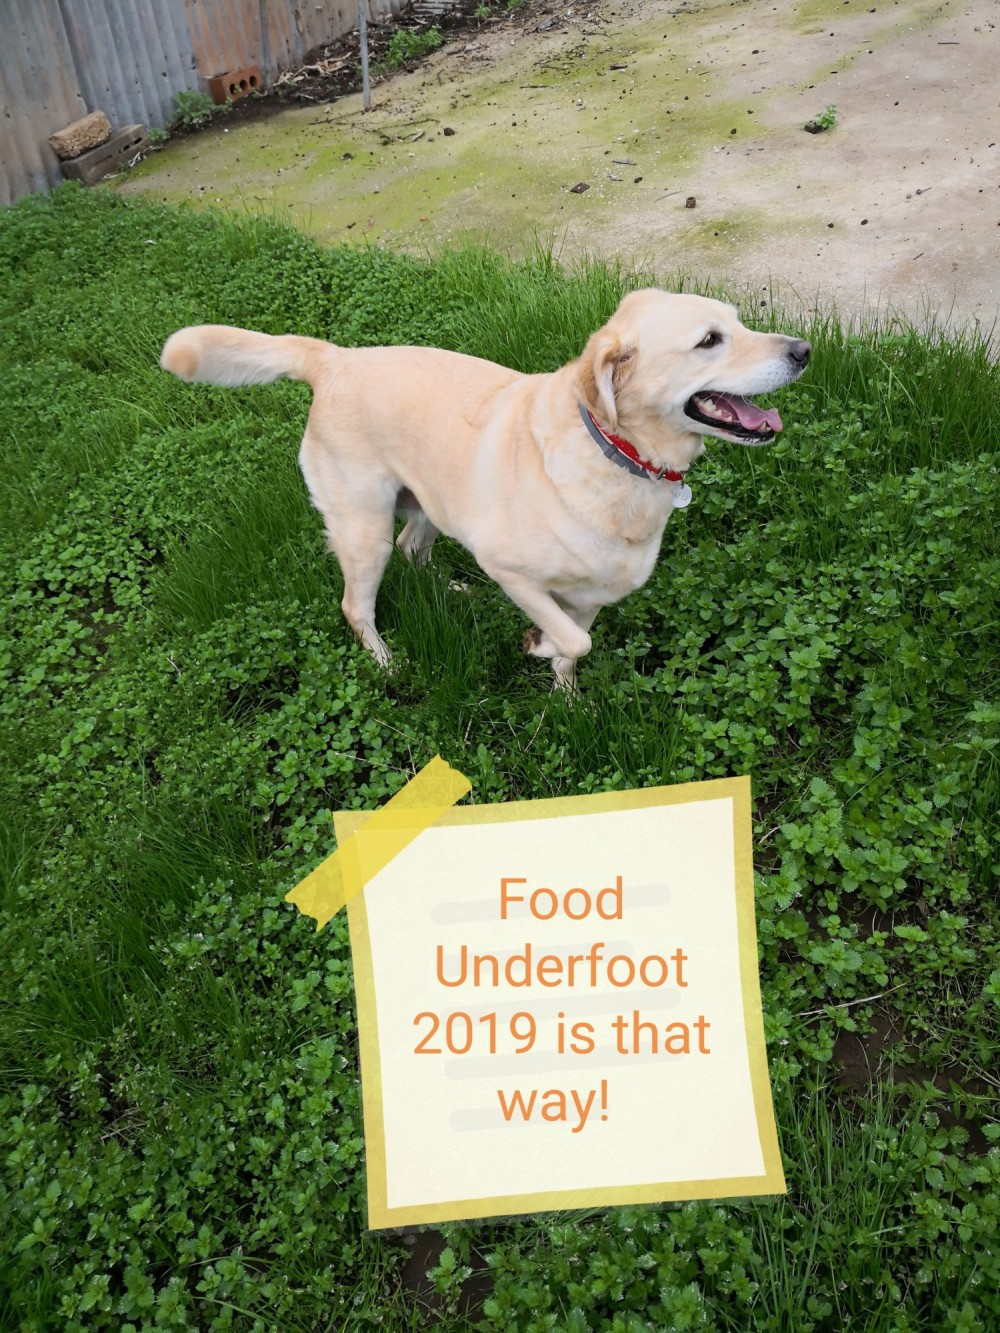 Food Underfoot 2019